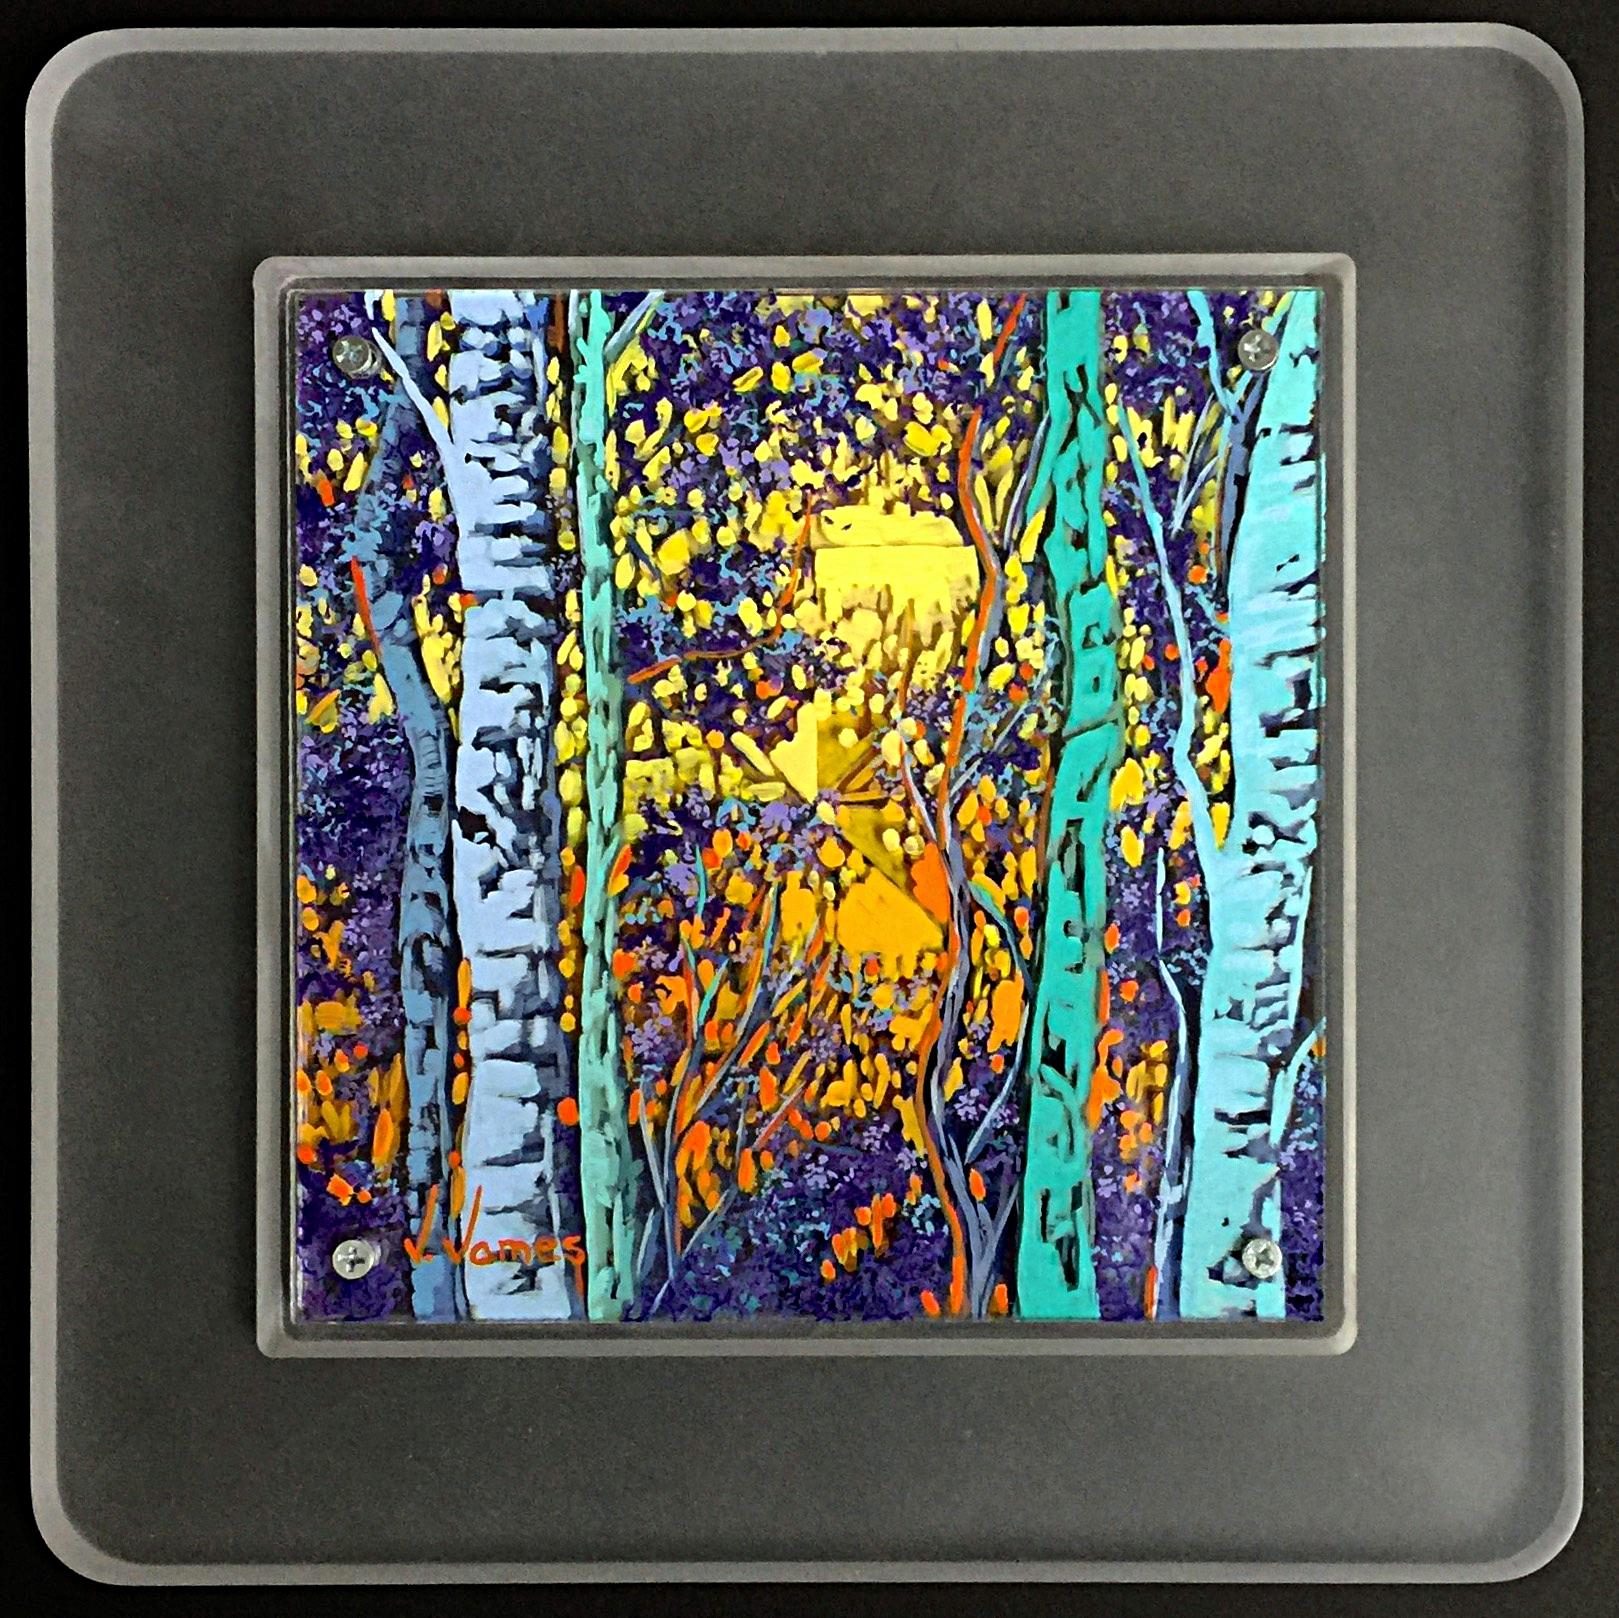 "Glimmer, 8"" x 8"" Acrylic on Multi-Layered Acrylic Glass"